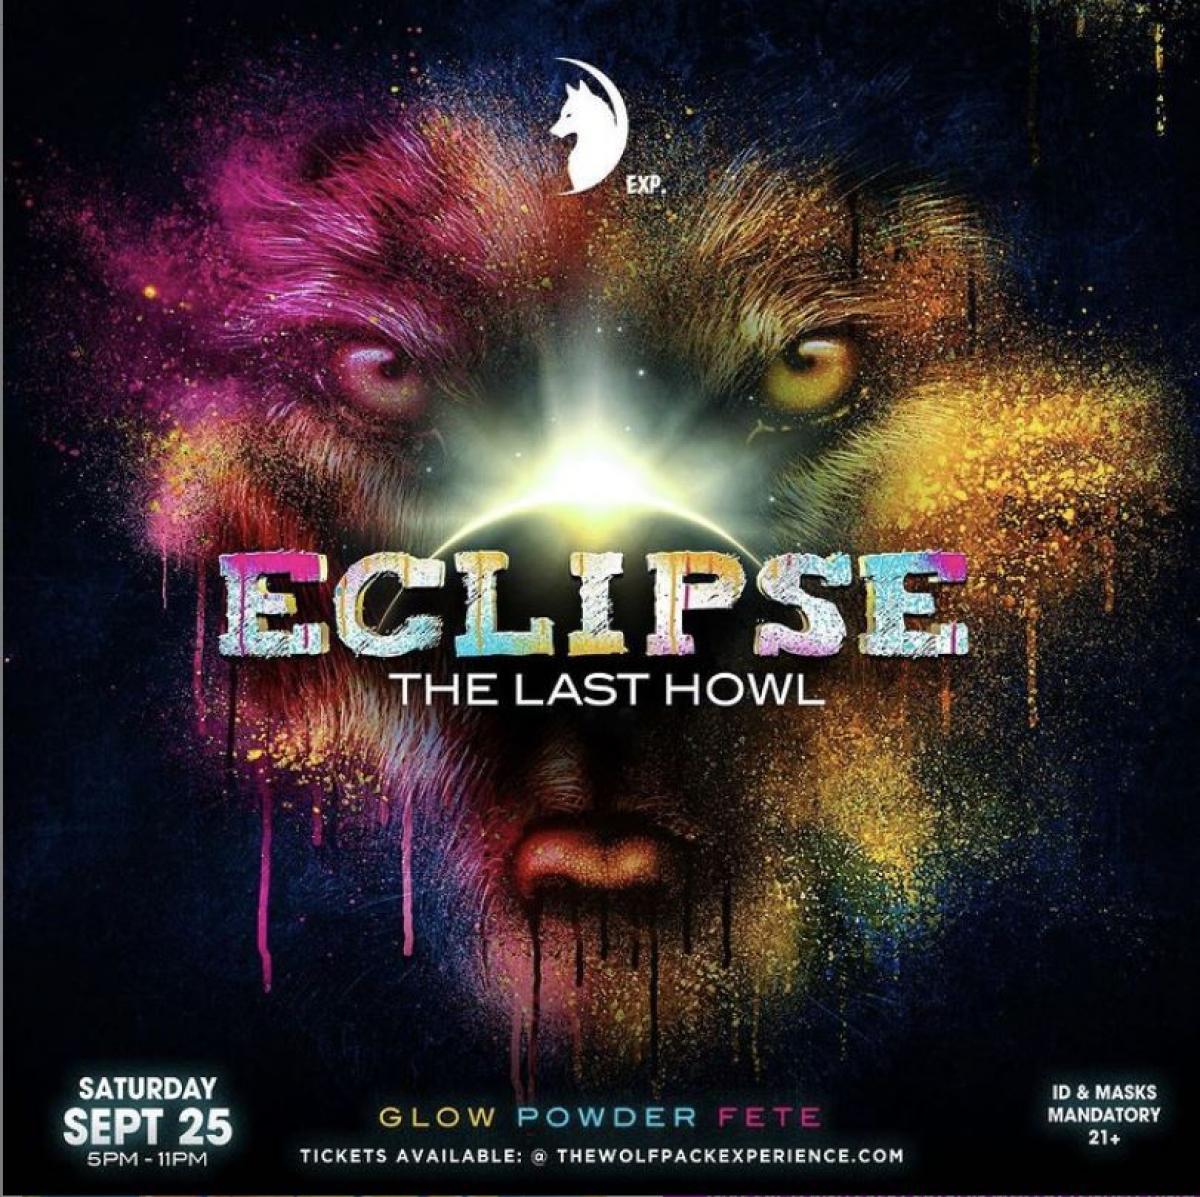 Eclipse: Glow Powder Jouvert flyer or graphic.